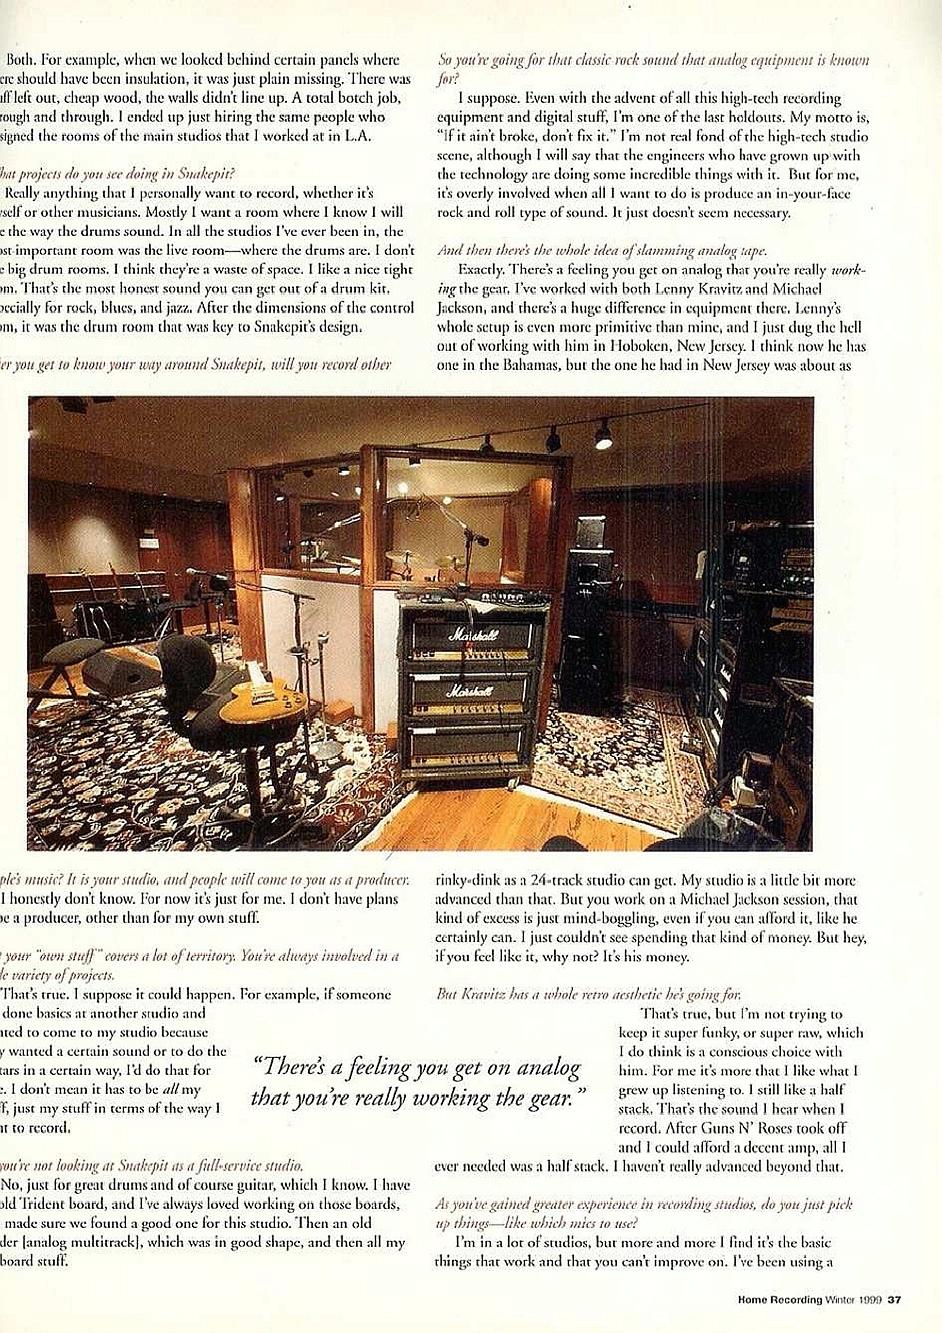 1999.01.DD - Home Recording Magazine - Slash In The Studio _slash10